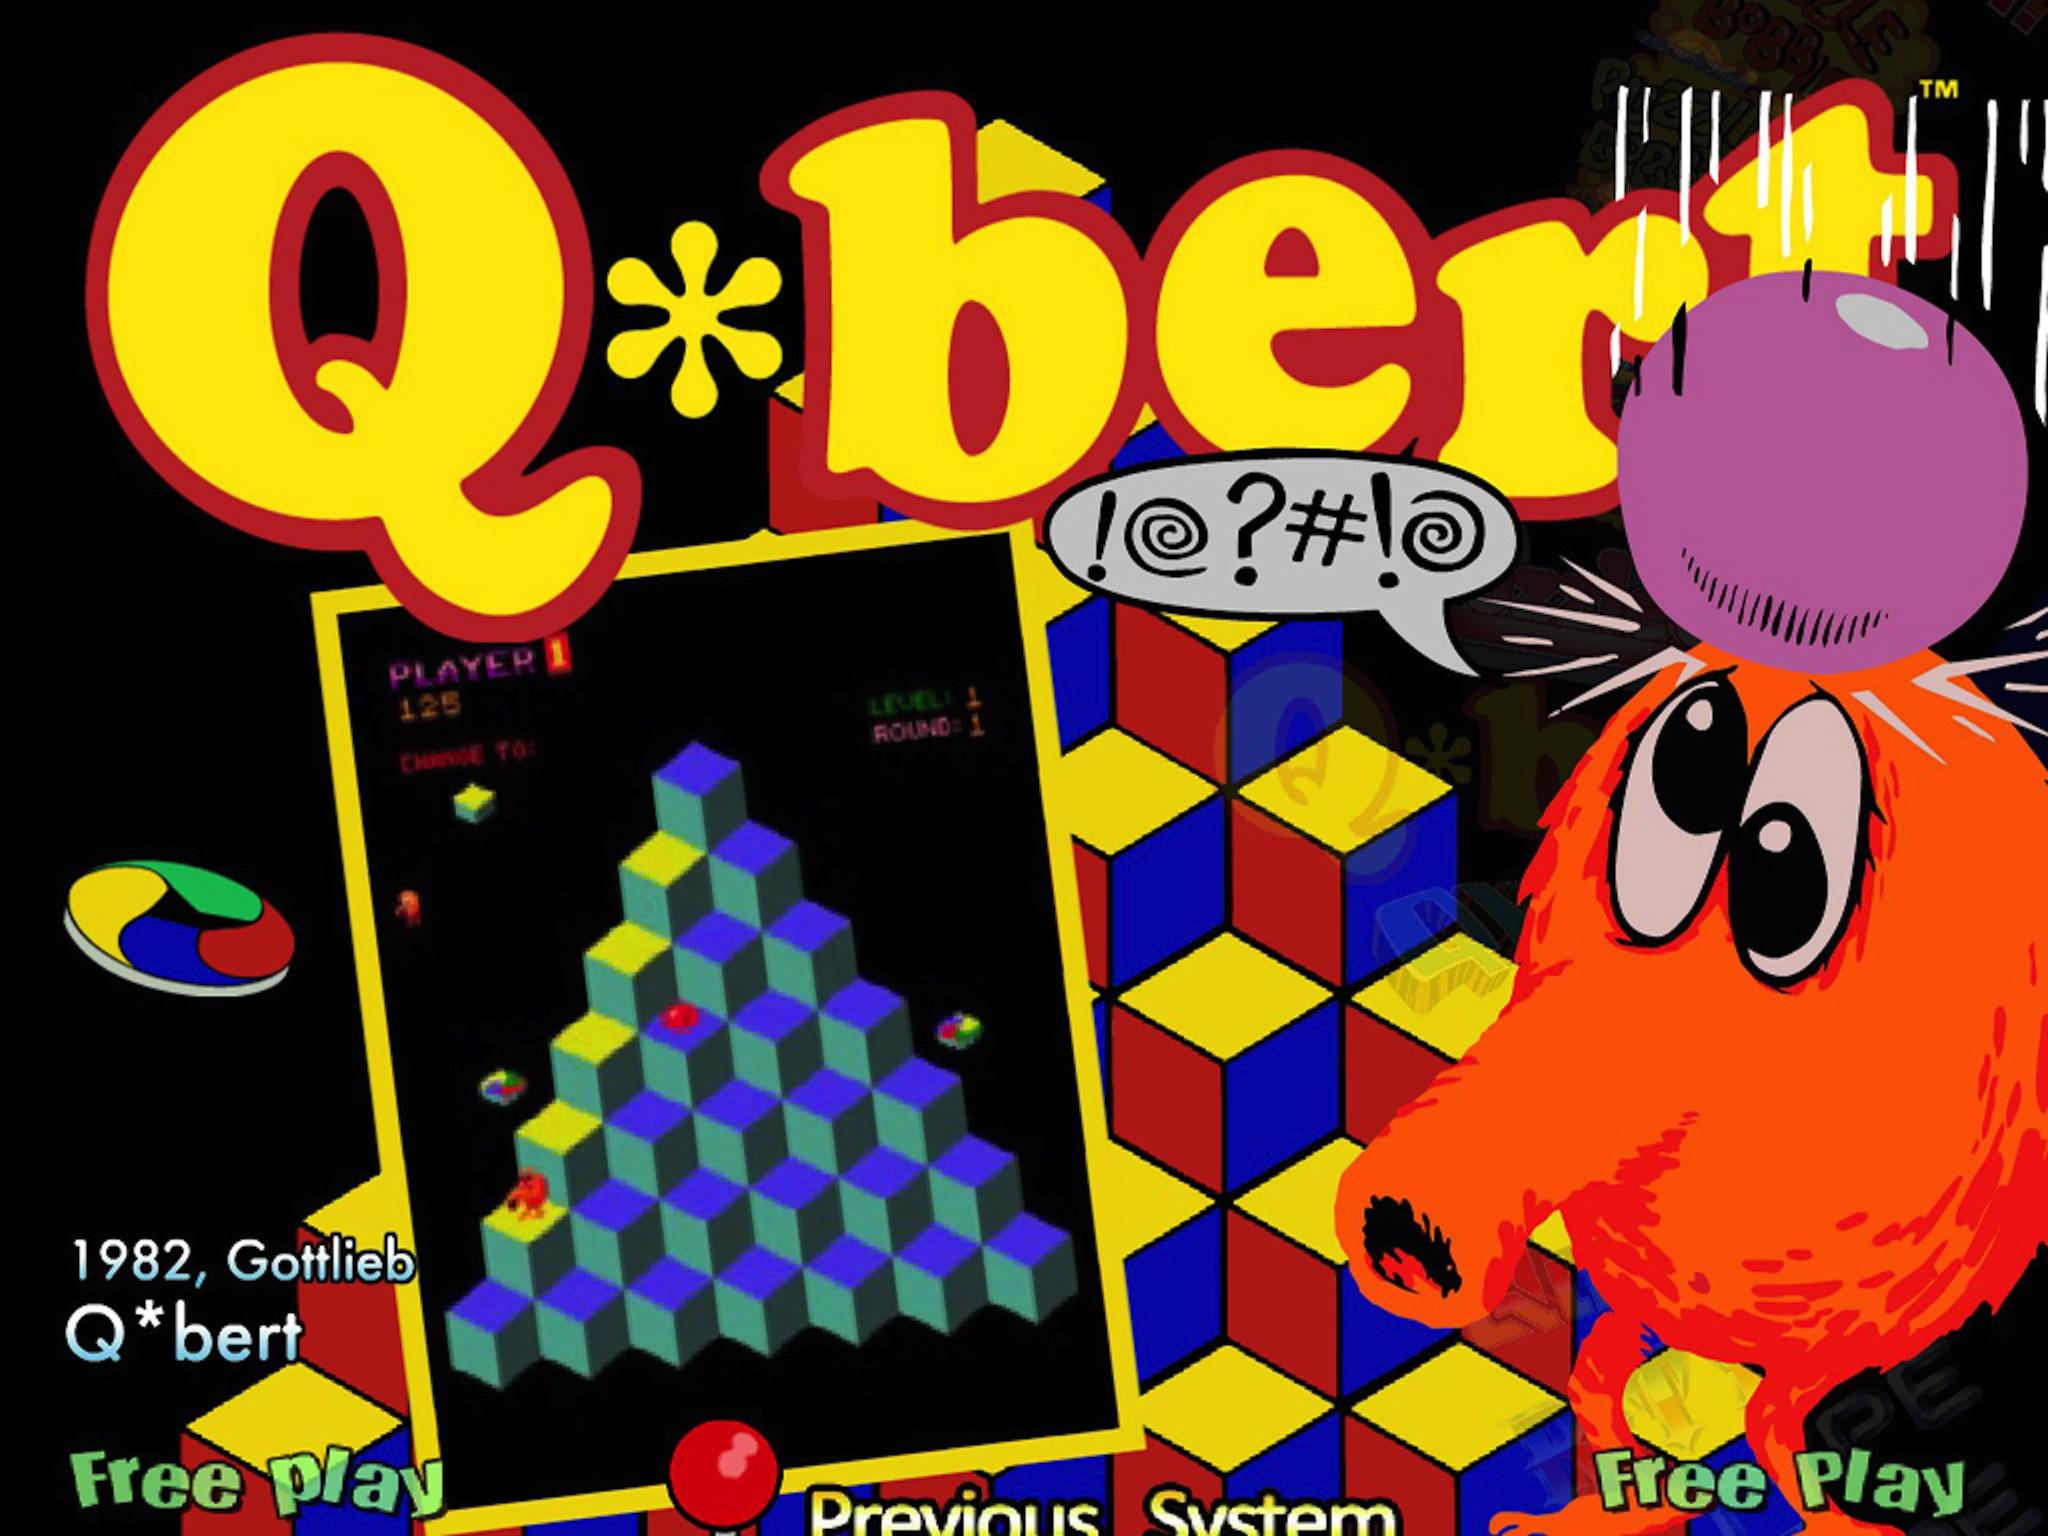 Qbert HD Wallpaper Background Image 2048x1536 ID395586 2048x1536